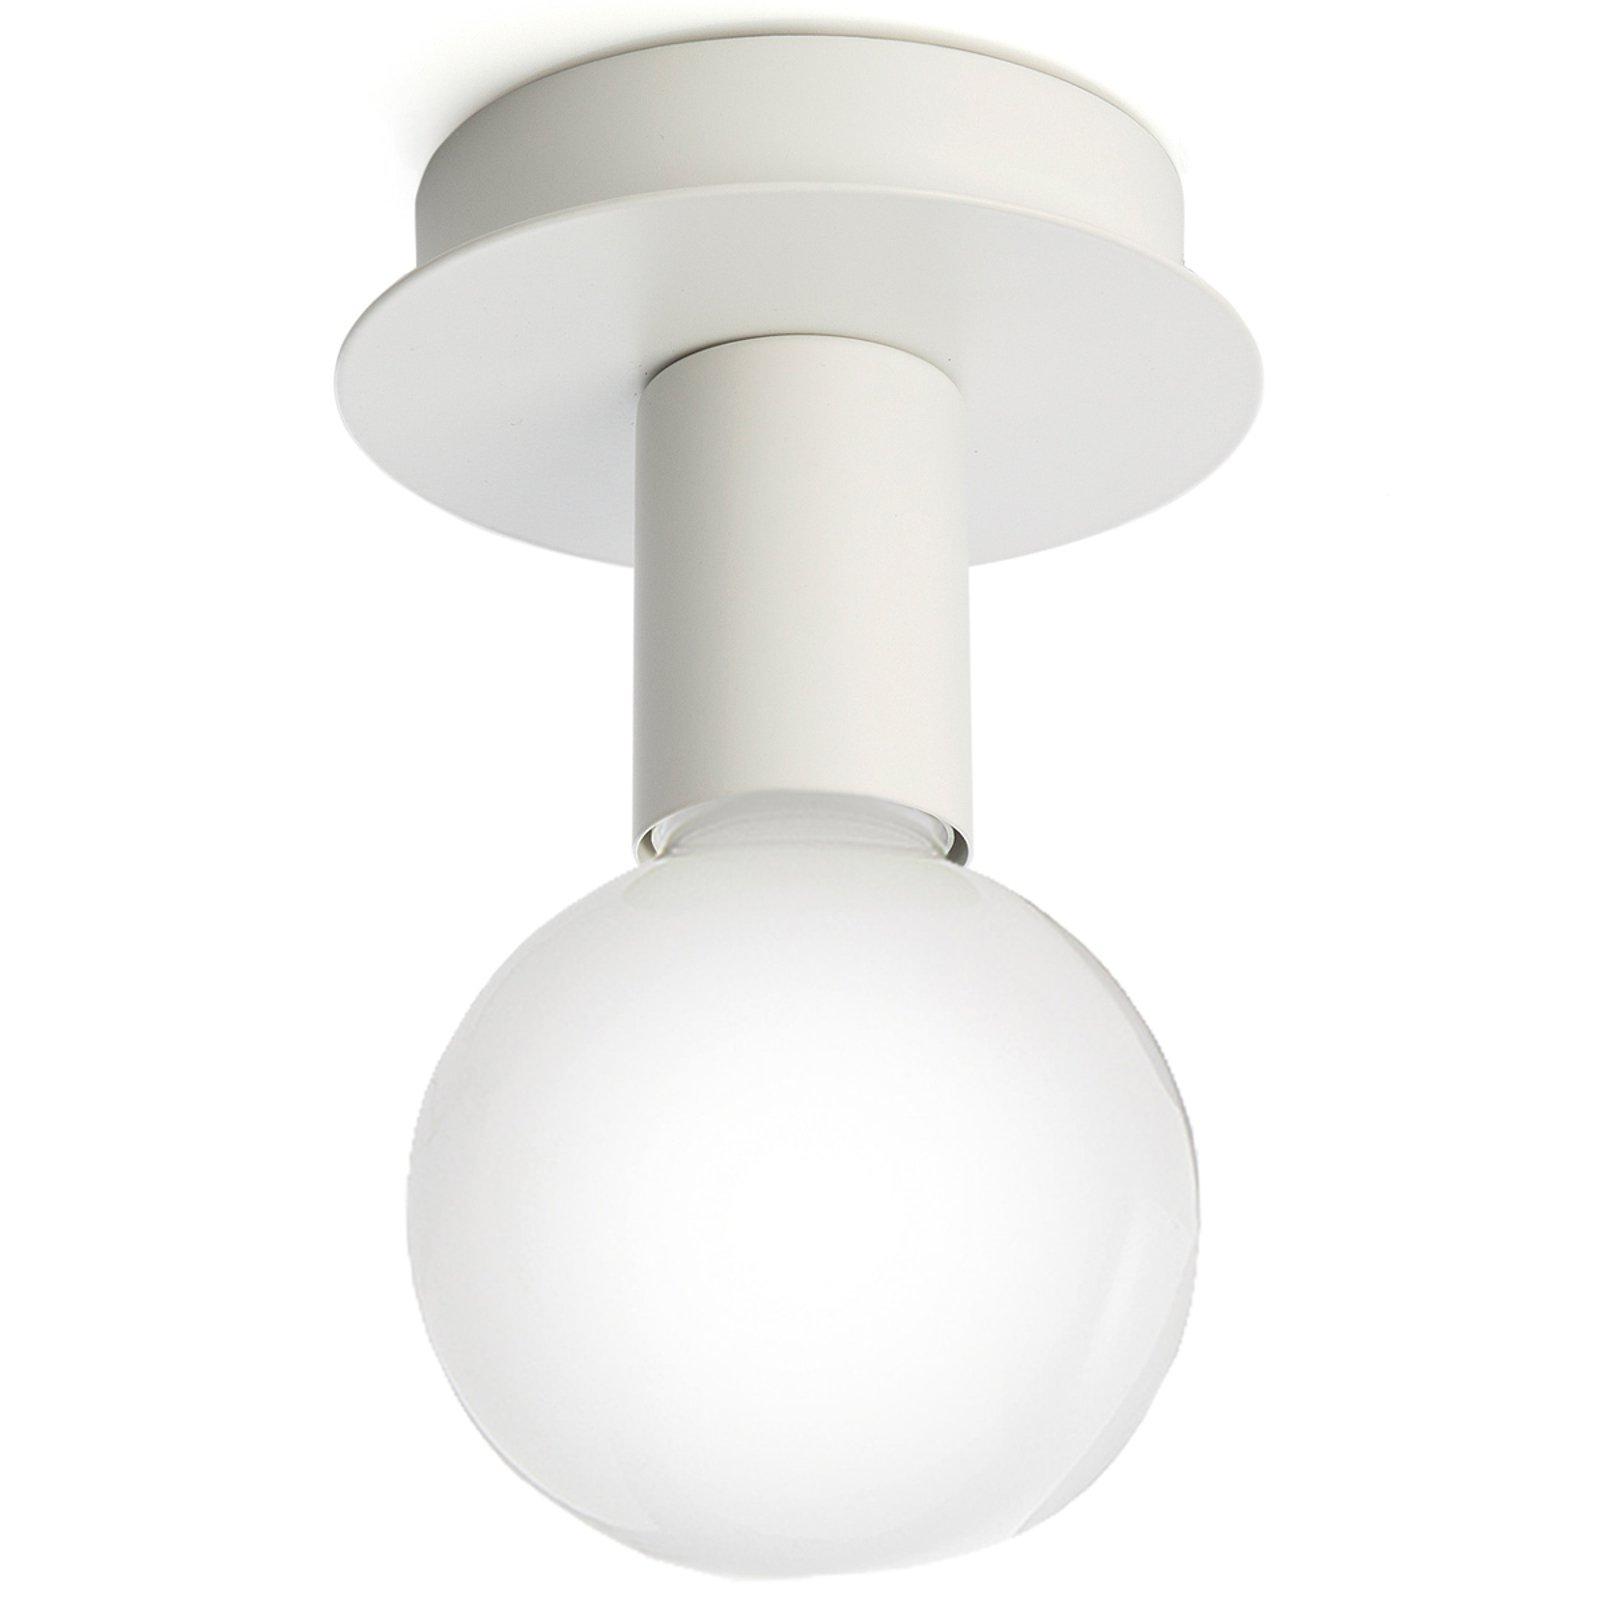 Trendy taklampe Lumetto - hvit